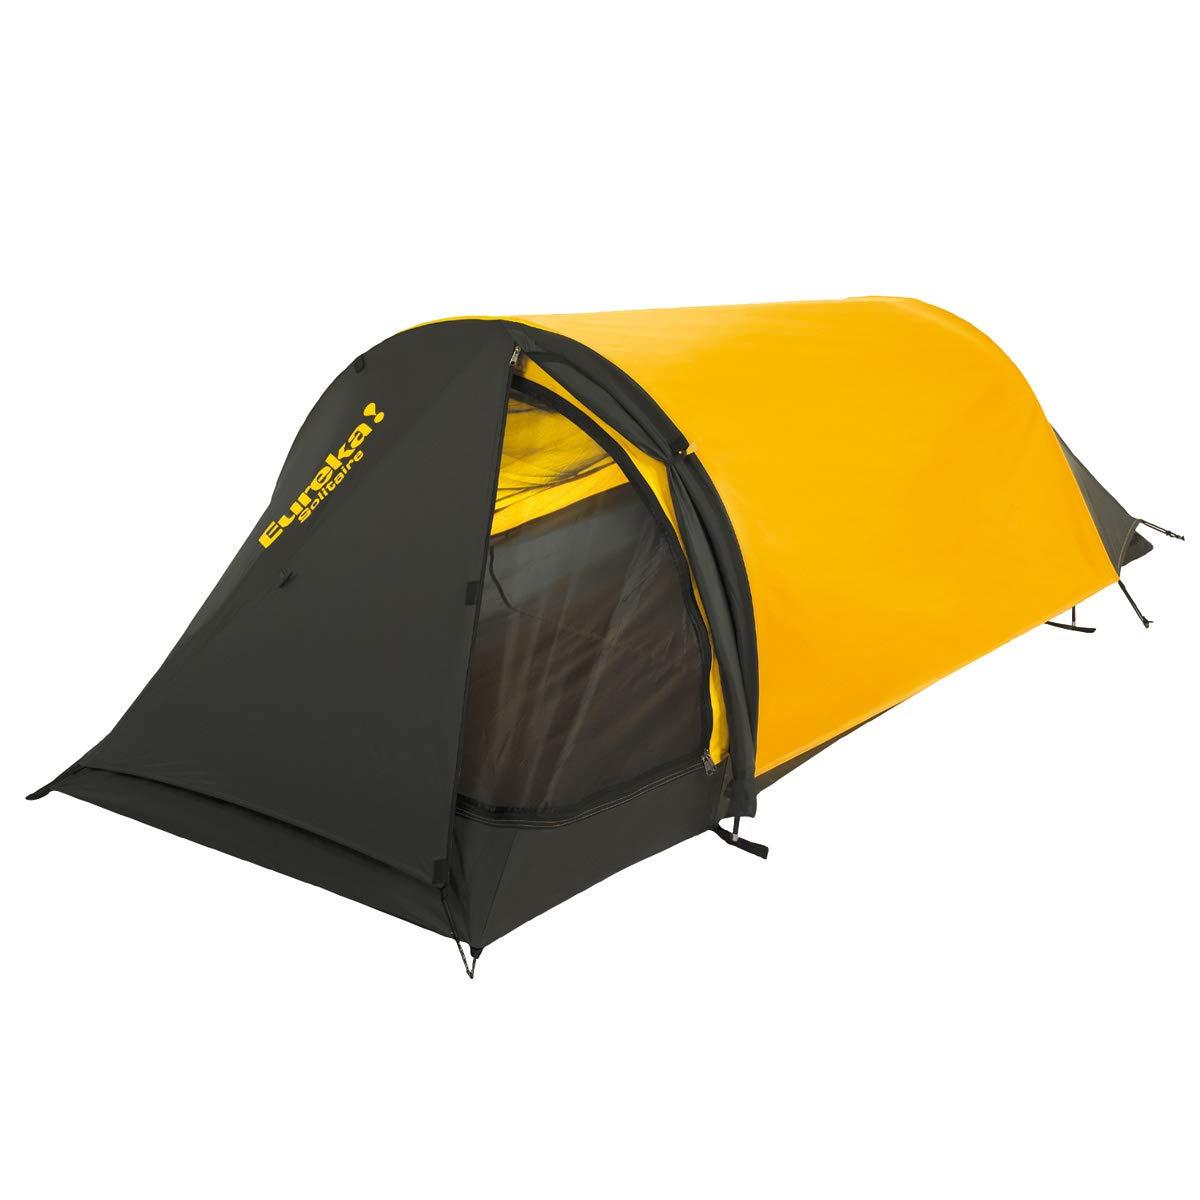 Eureka Solitaire Bivy Style Tent